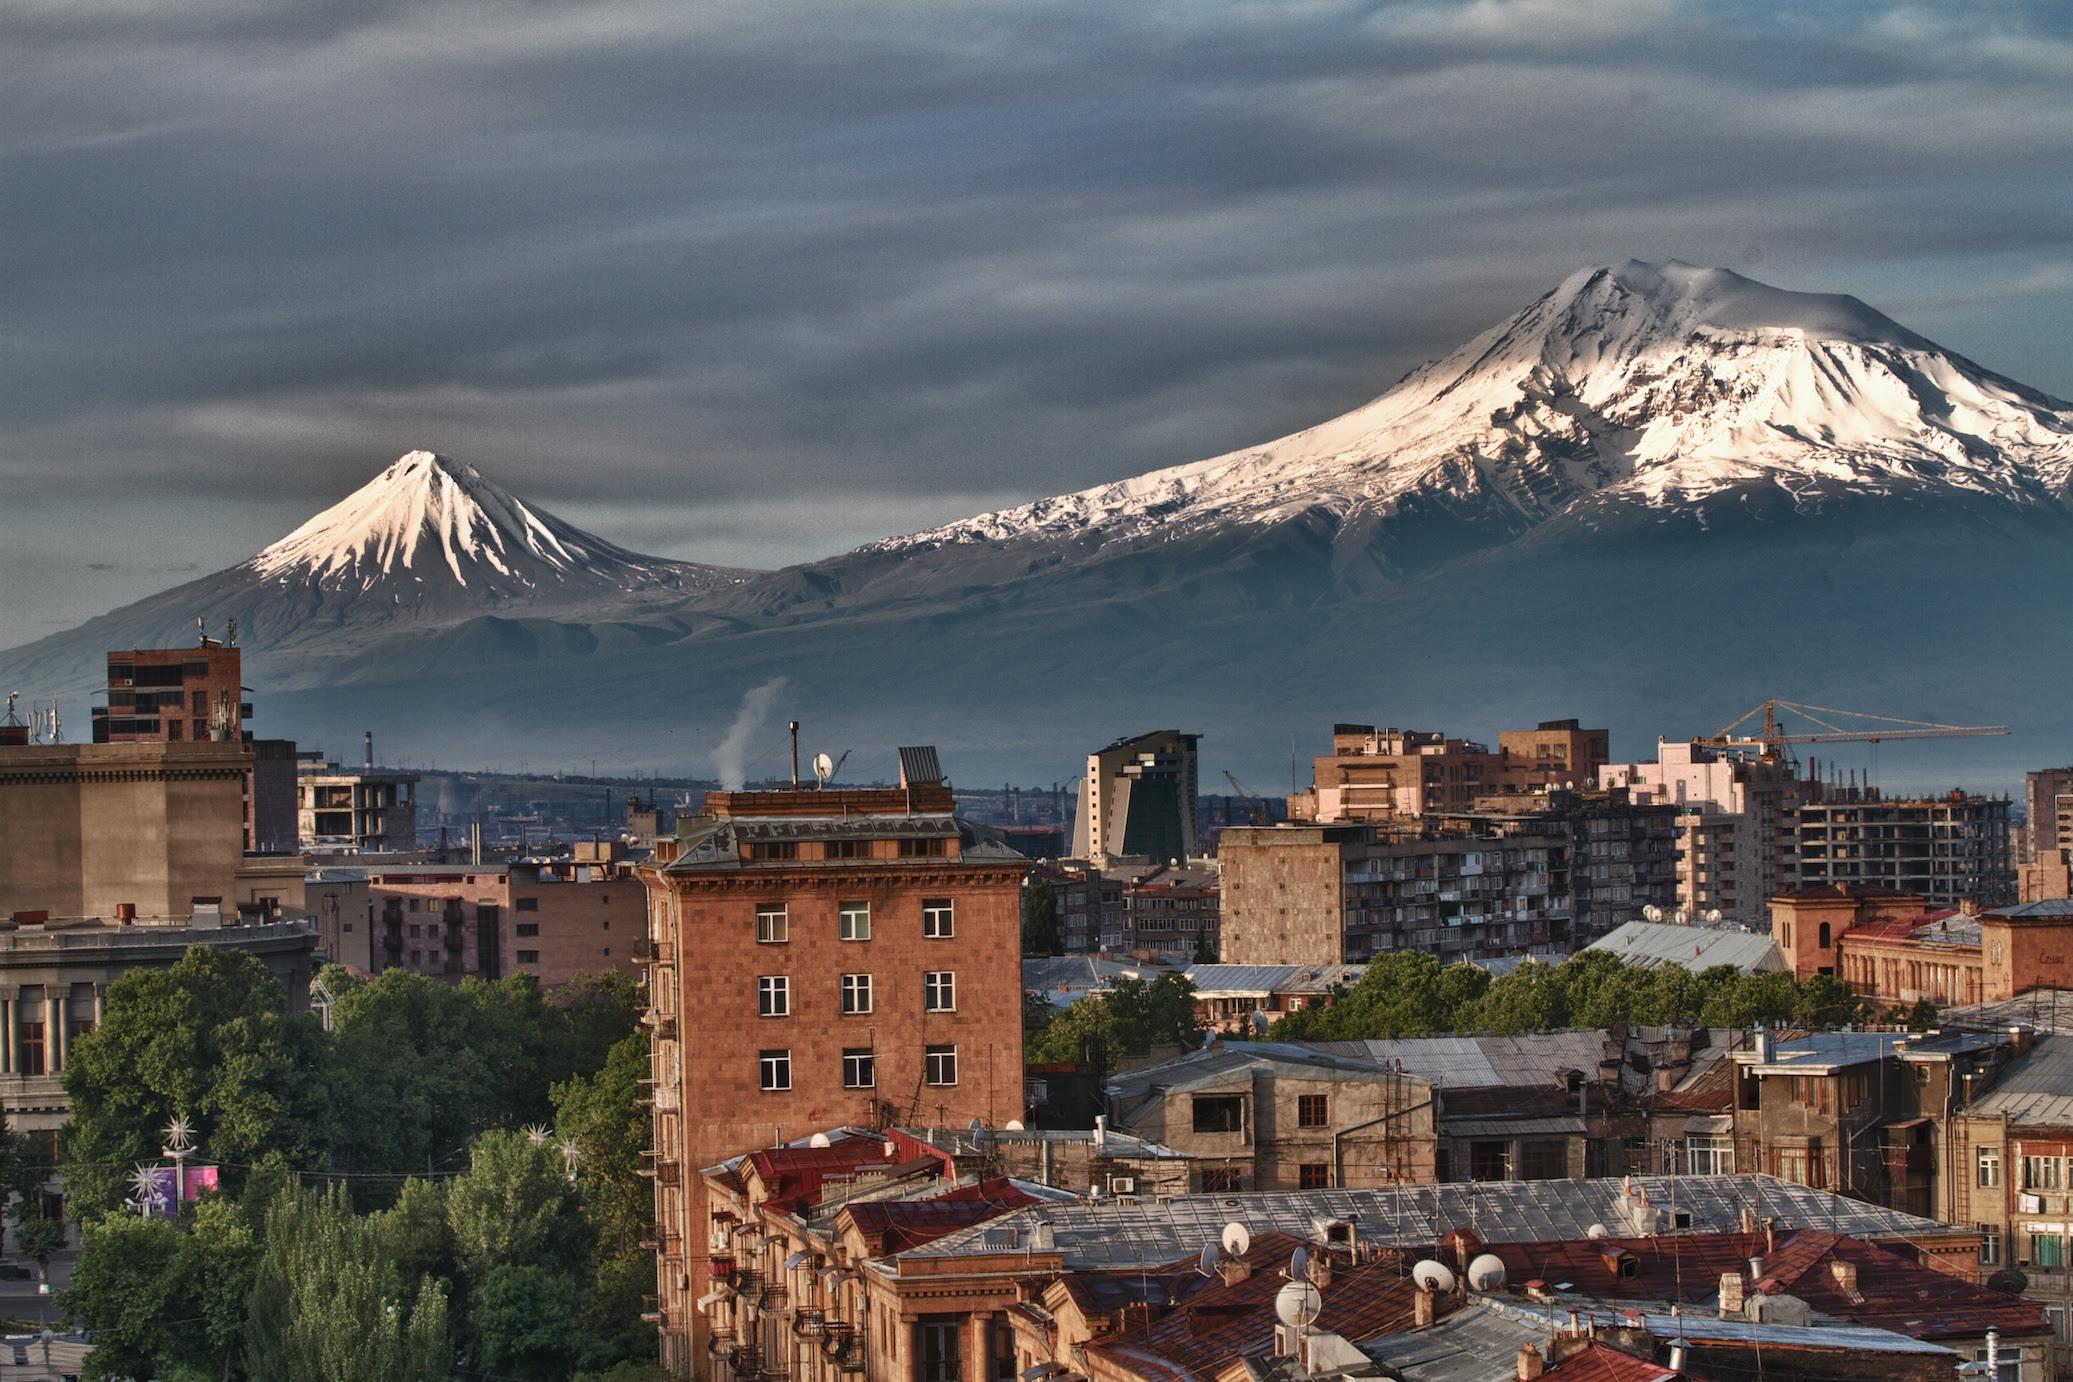 http://barevarmenia.com/travelblog/wp-content/uploads/2012/04/Mount-Ararat-Yerevan-Cascade.jpg